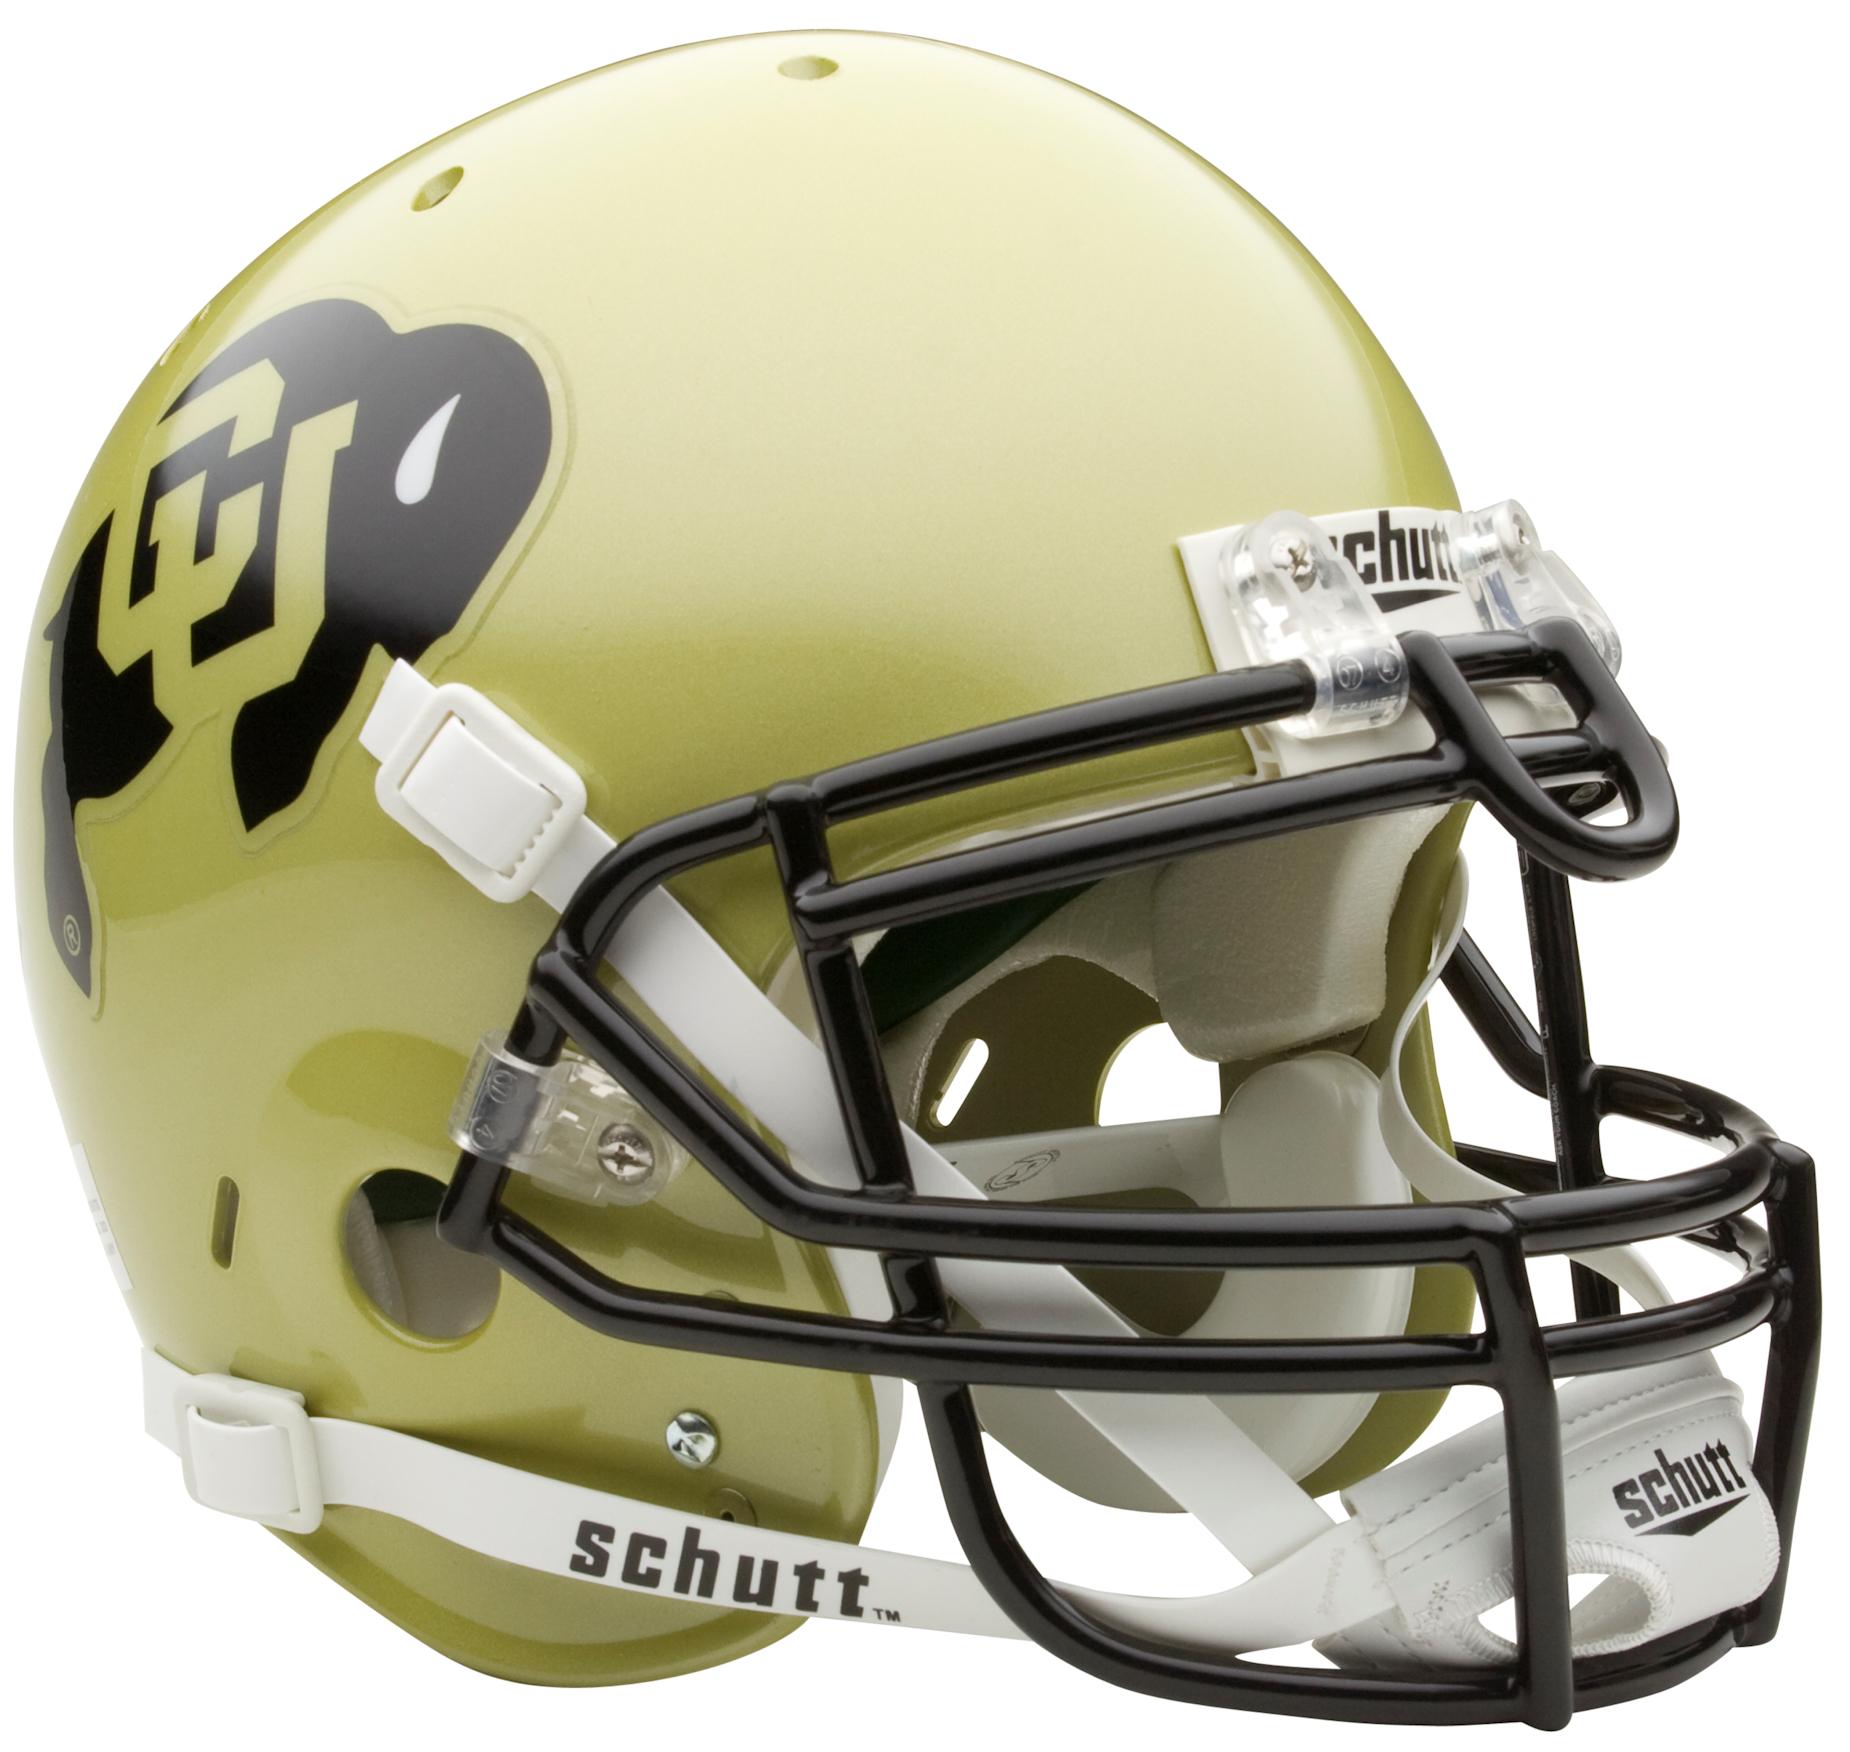 Colorado Buffaloes Authentic College XP Football Helmet Schutt